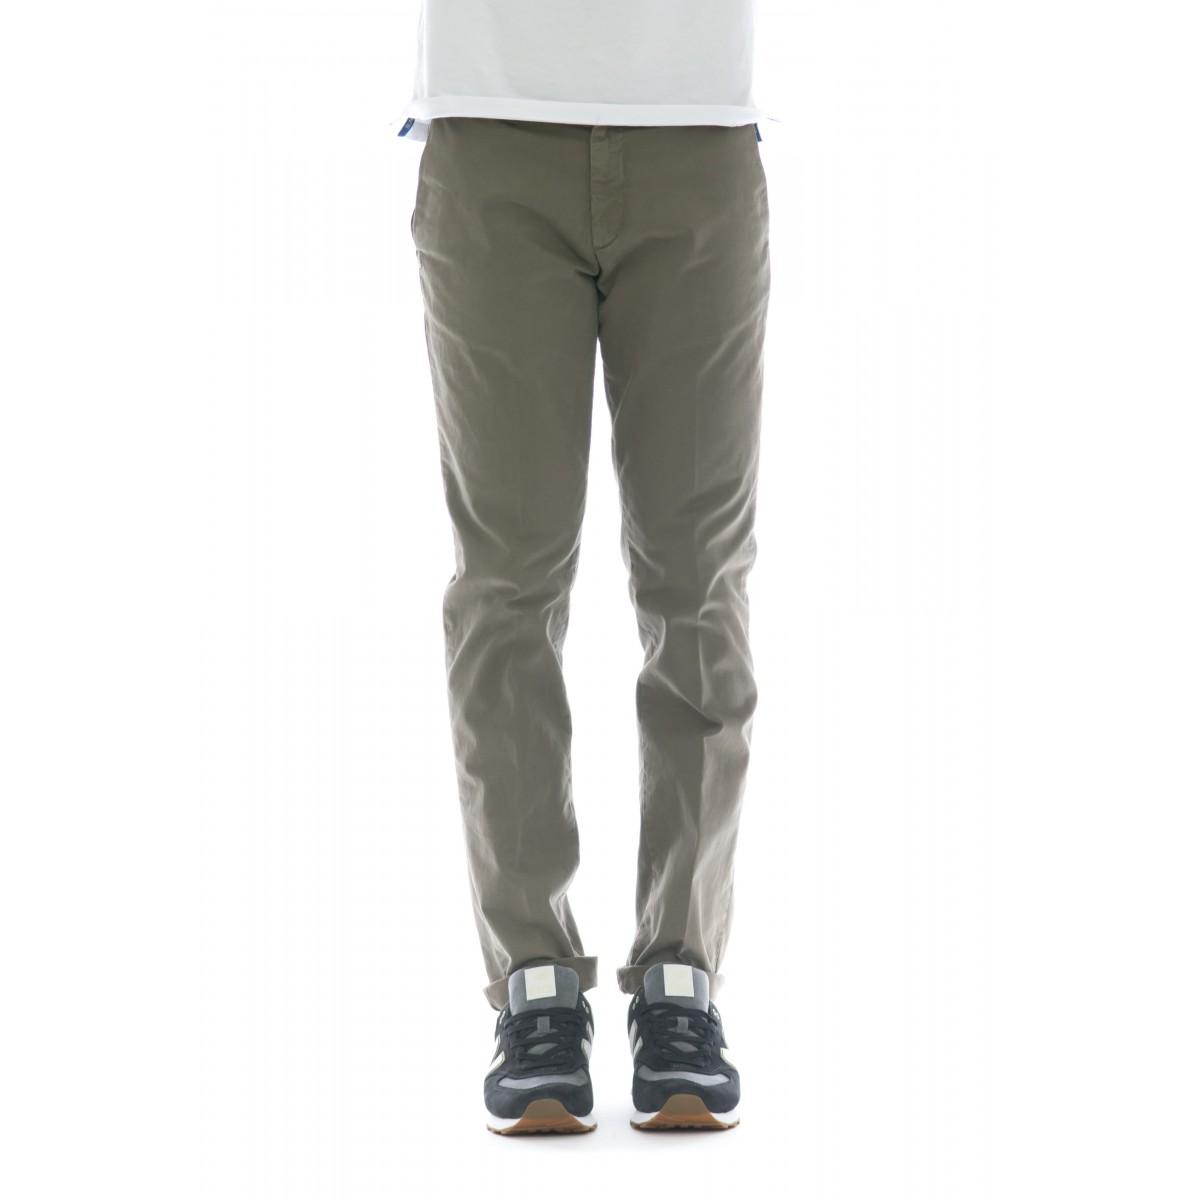 Pantalone uomo - Lenny 4569 gabardina lavat slim strech